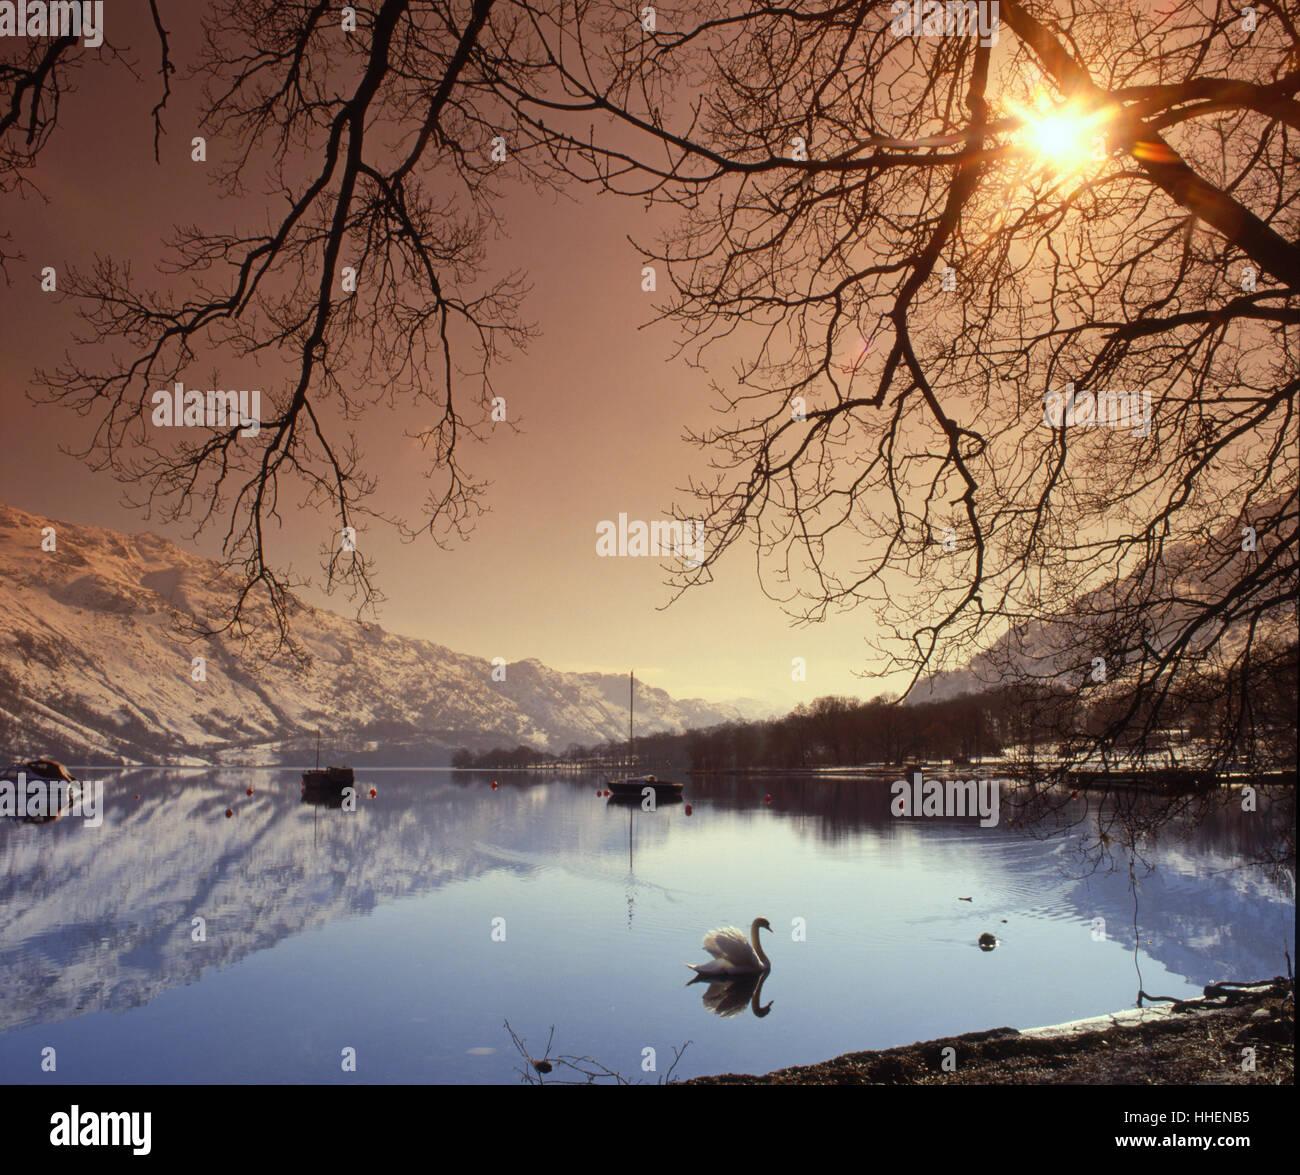 Winter starburst over Loch Lomond, Scotland - Stock Image